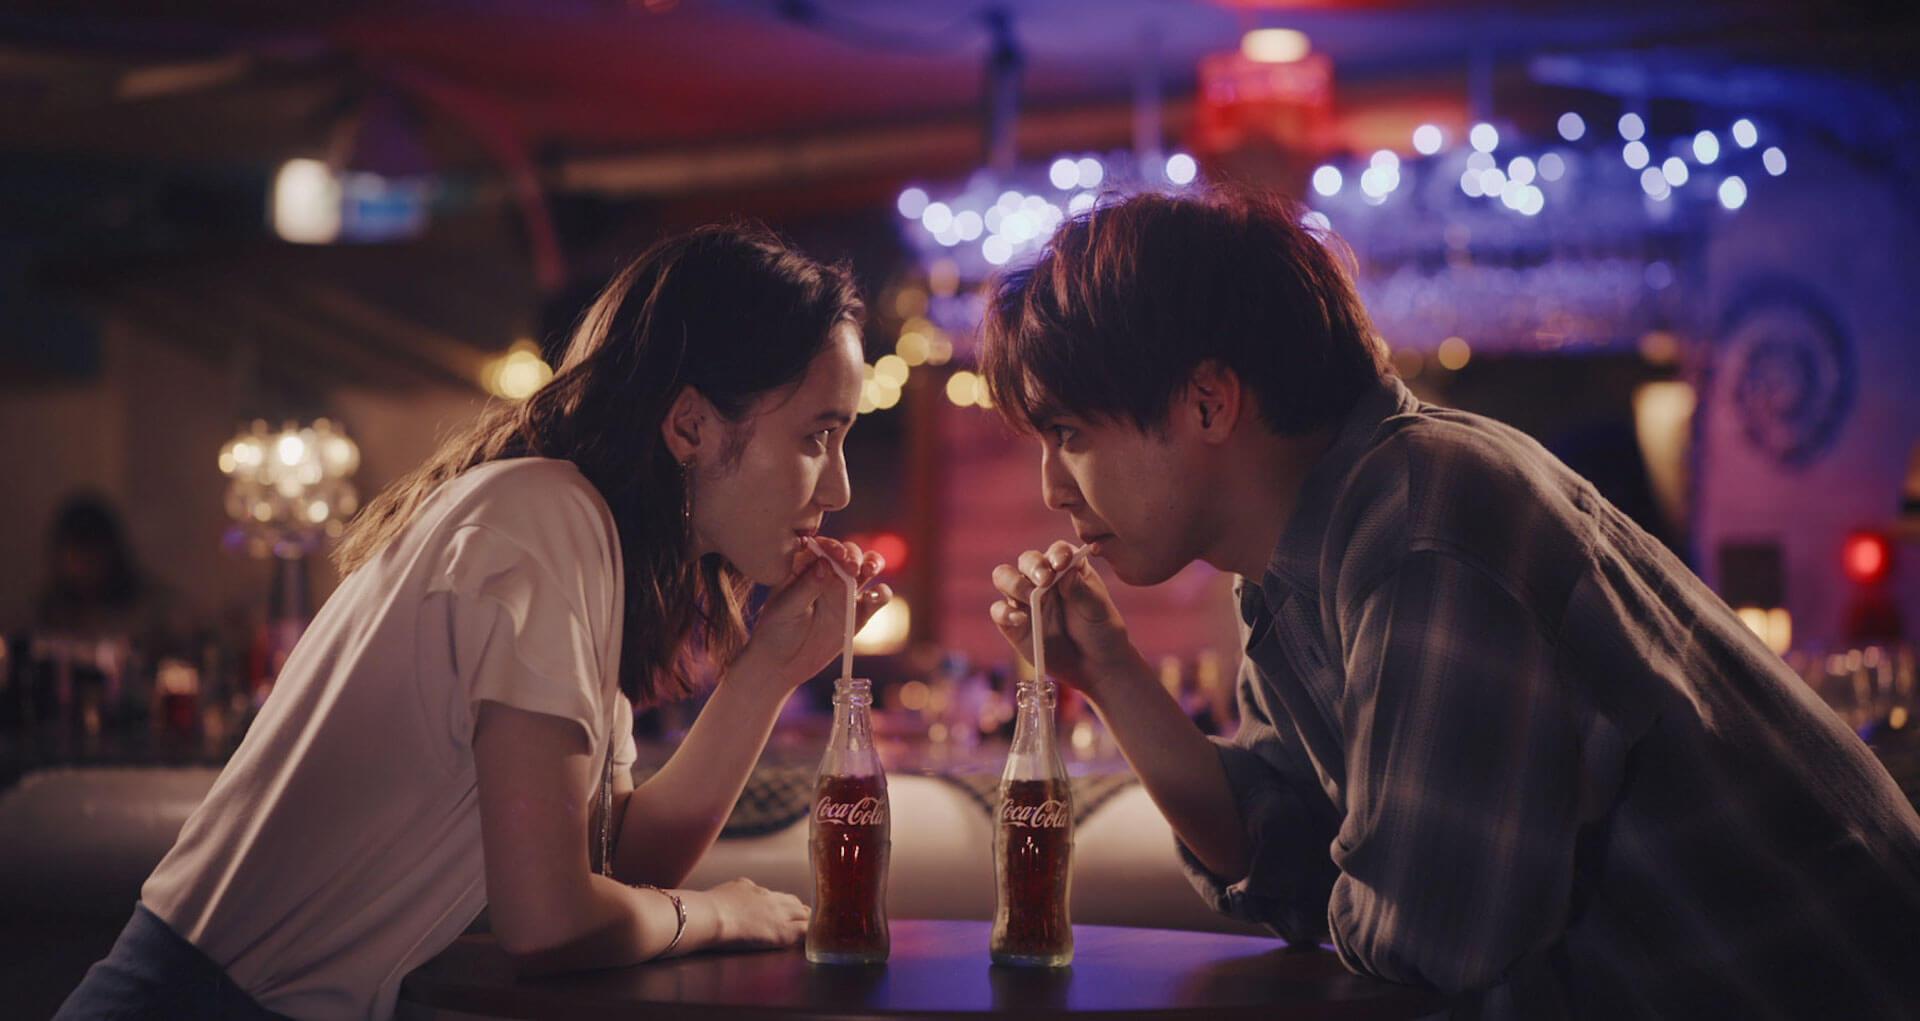 GENERATIONS片寄涼太扮する綾瀬楓が「コカ・コーラ」CMに出演!?全女子の夢と妄想いっぱいの劇中CM映像が公開 NIGHT_s